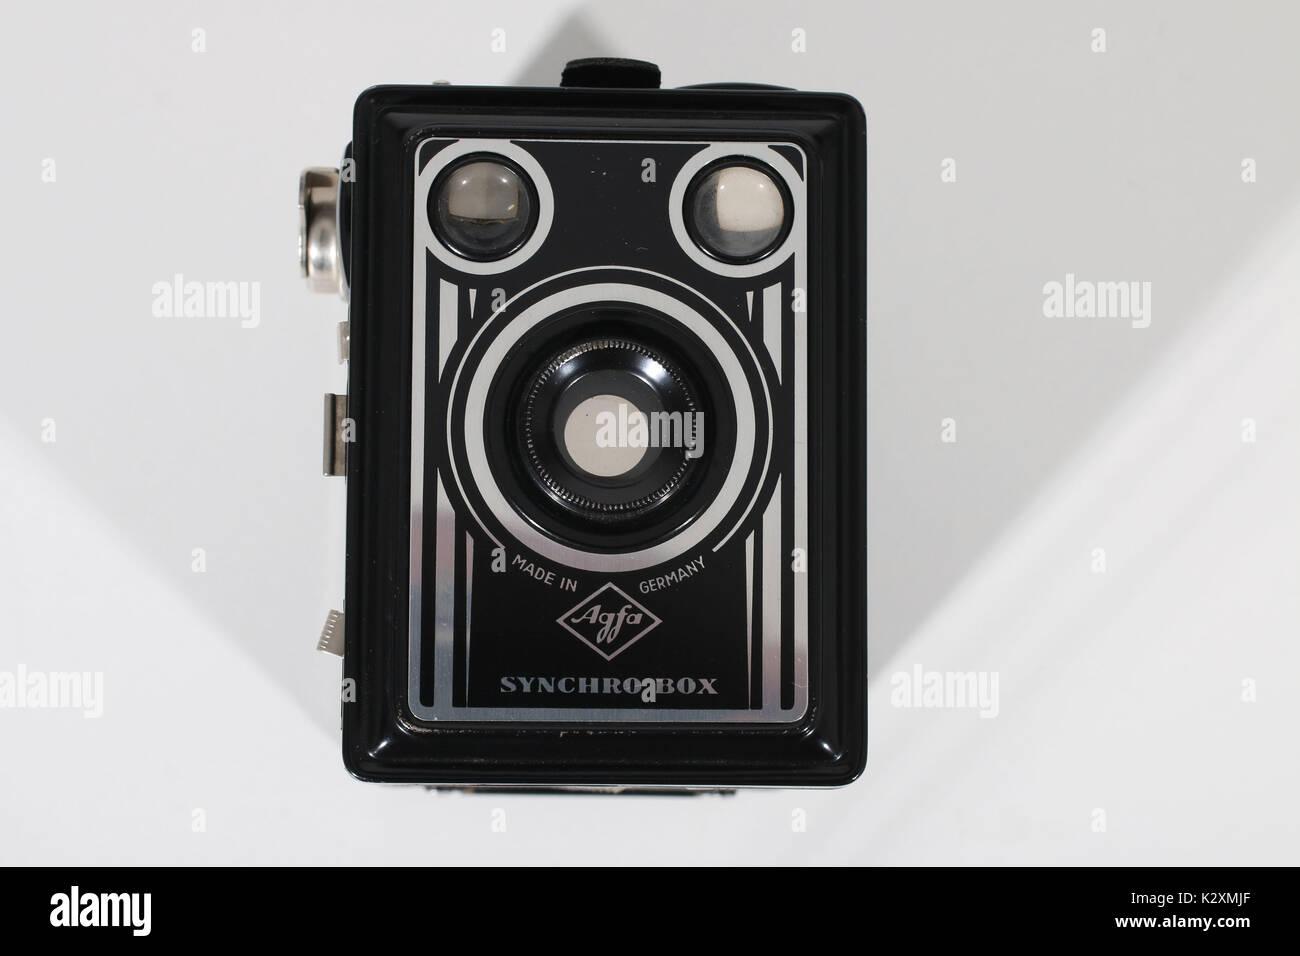 Kamera, Fotoapparat, fotografieren, historisch, Foto, Agfa, Box, Rollfilm, historisch - Stock Image